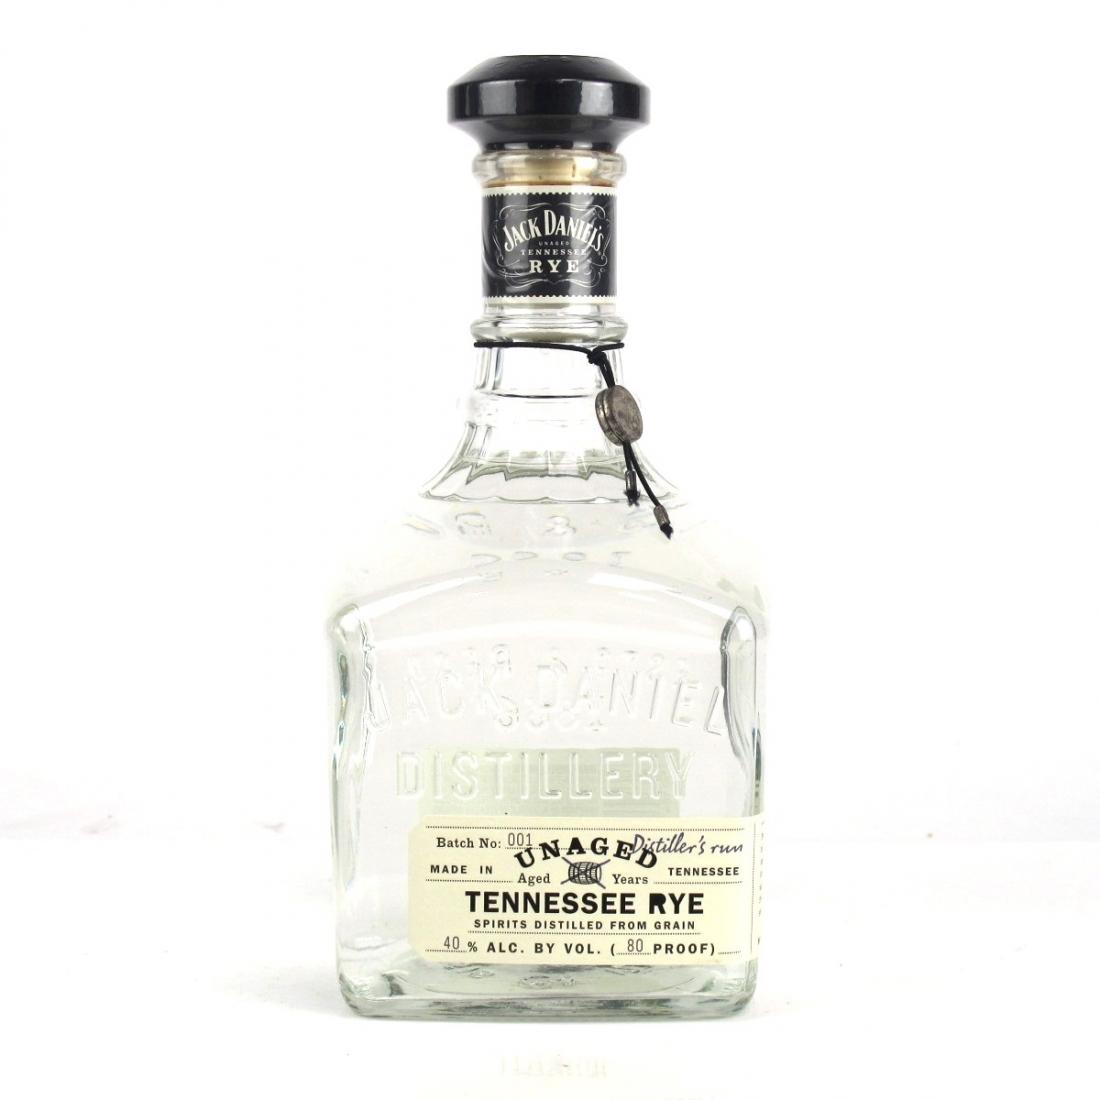 Jack Daniel's Unaged Tennessee Rye Batch #1